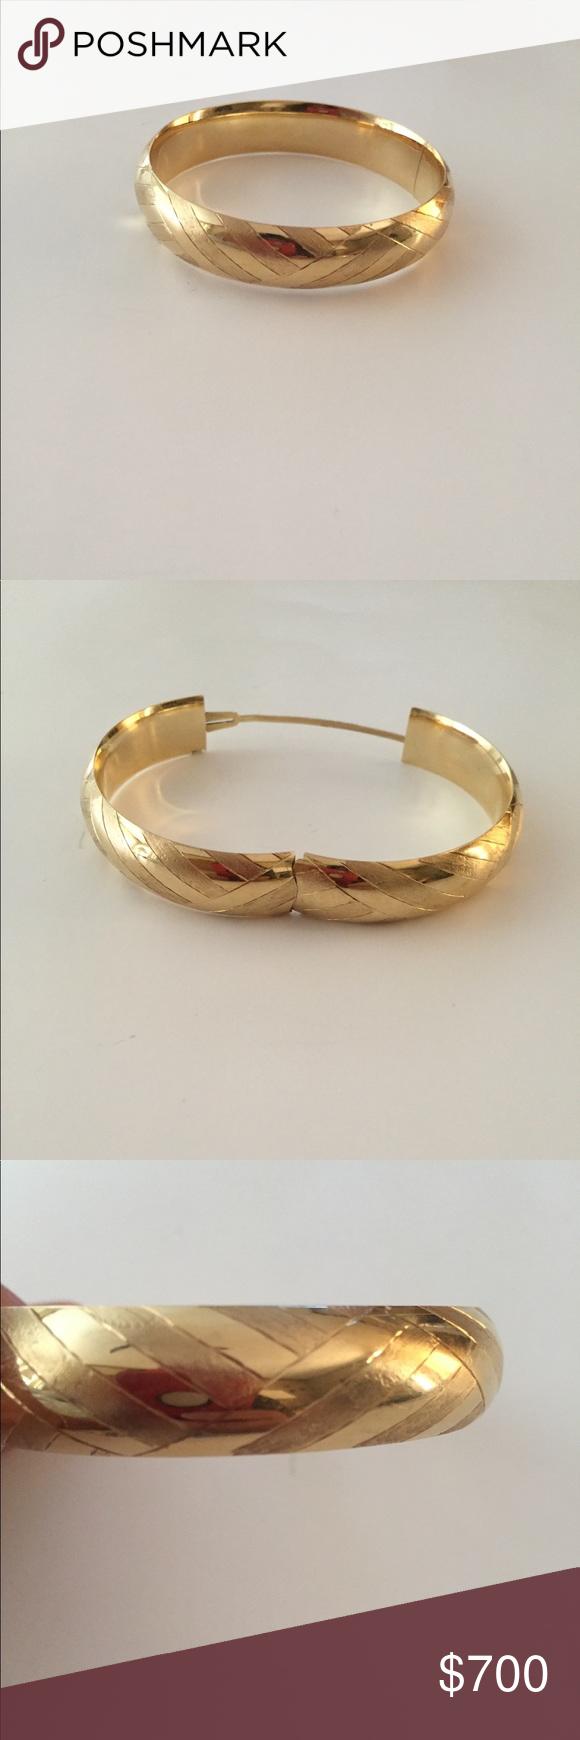 Vintage k yellow gold bangle g make offer gold bangles